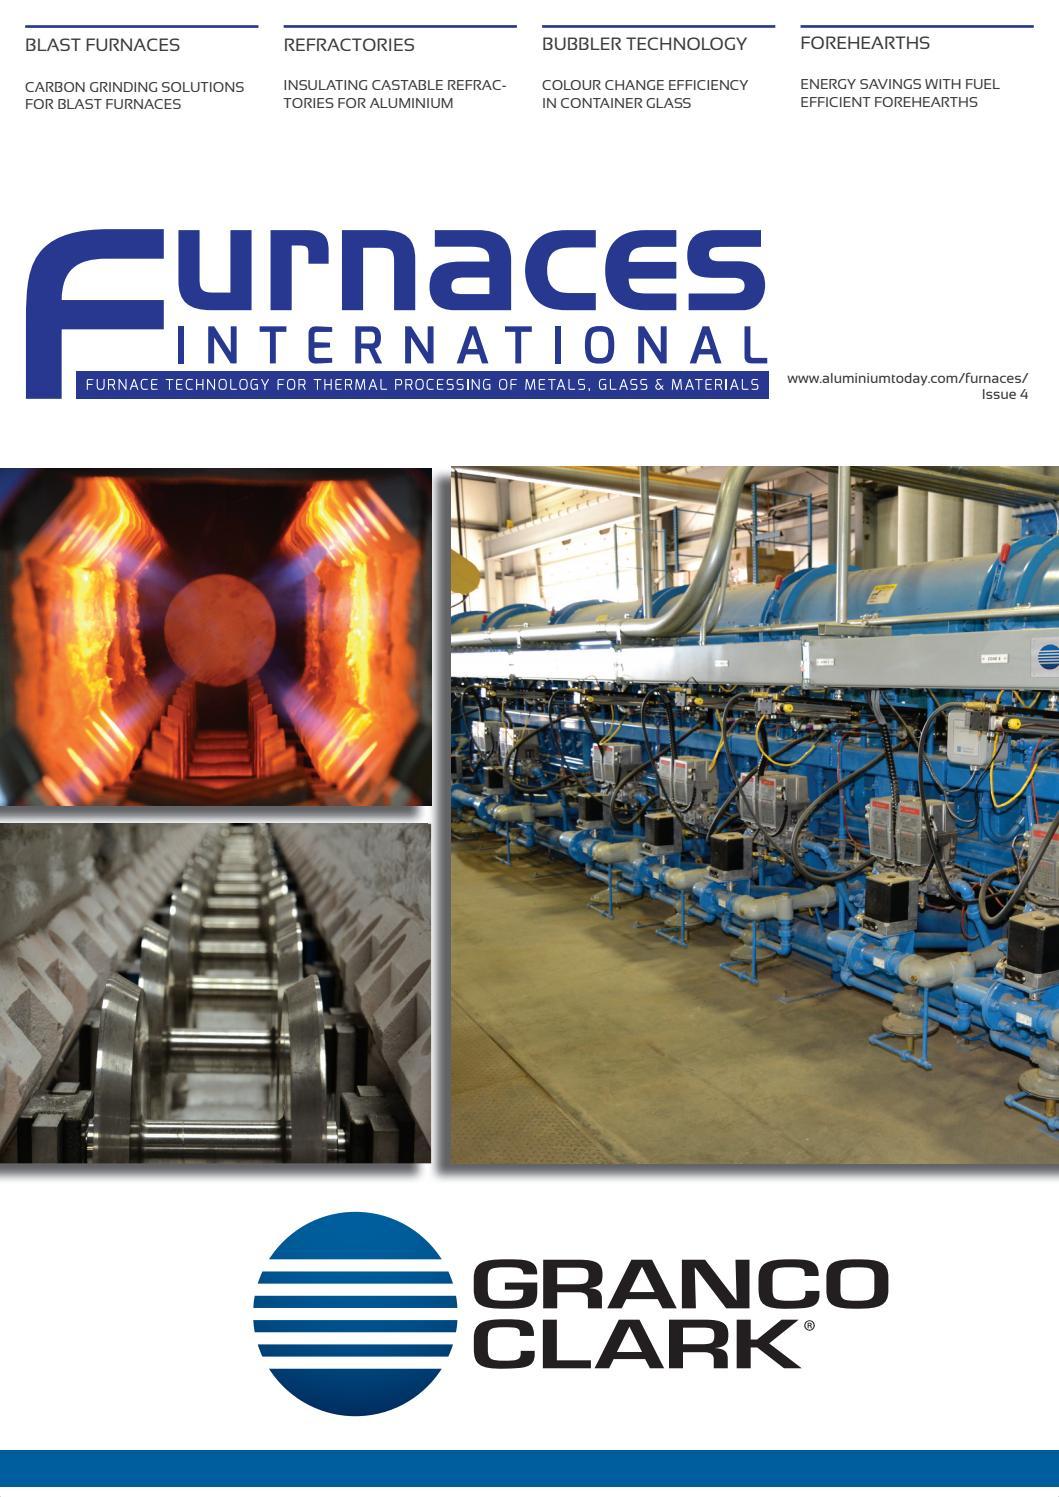 Qr Code Reader >> Furnaces International Issue 4 by Quartz - Issuu